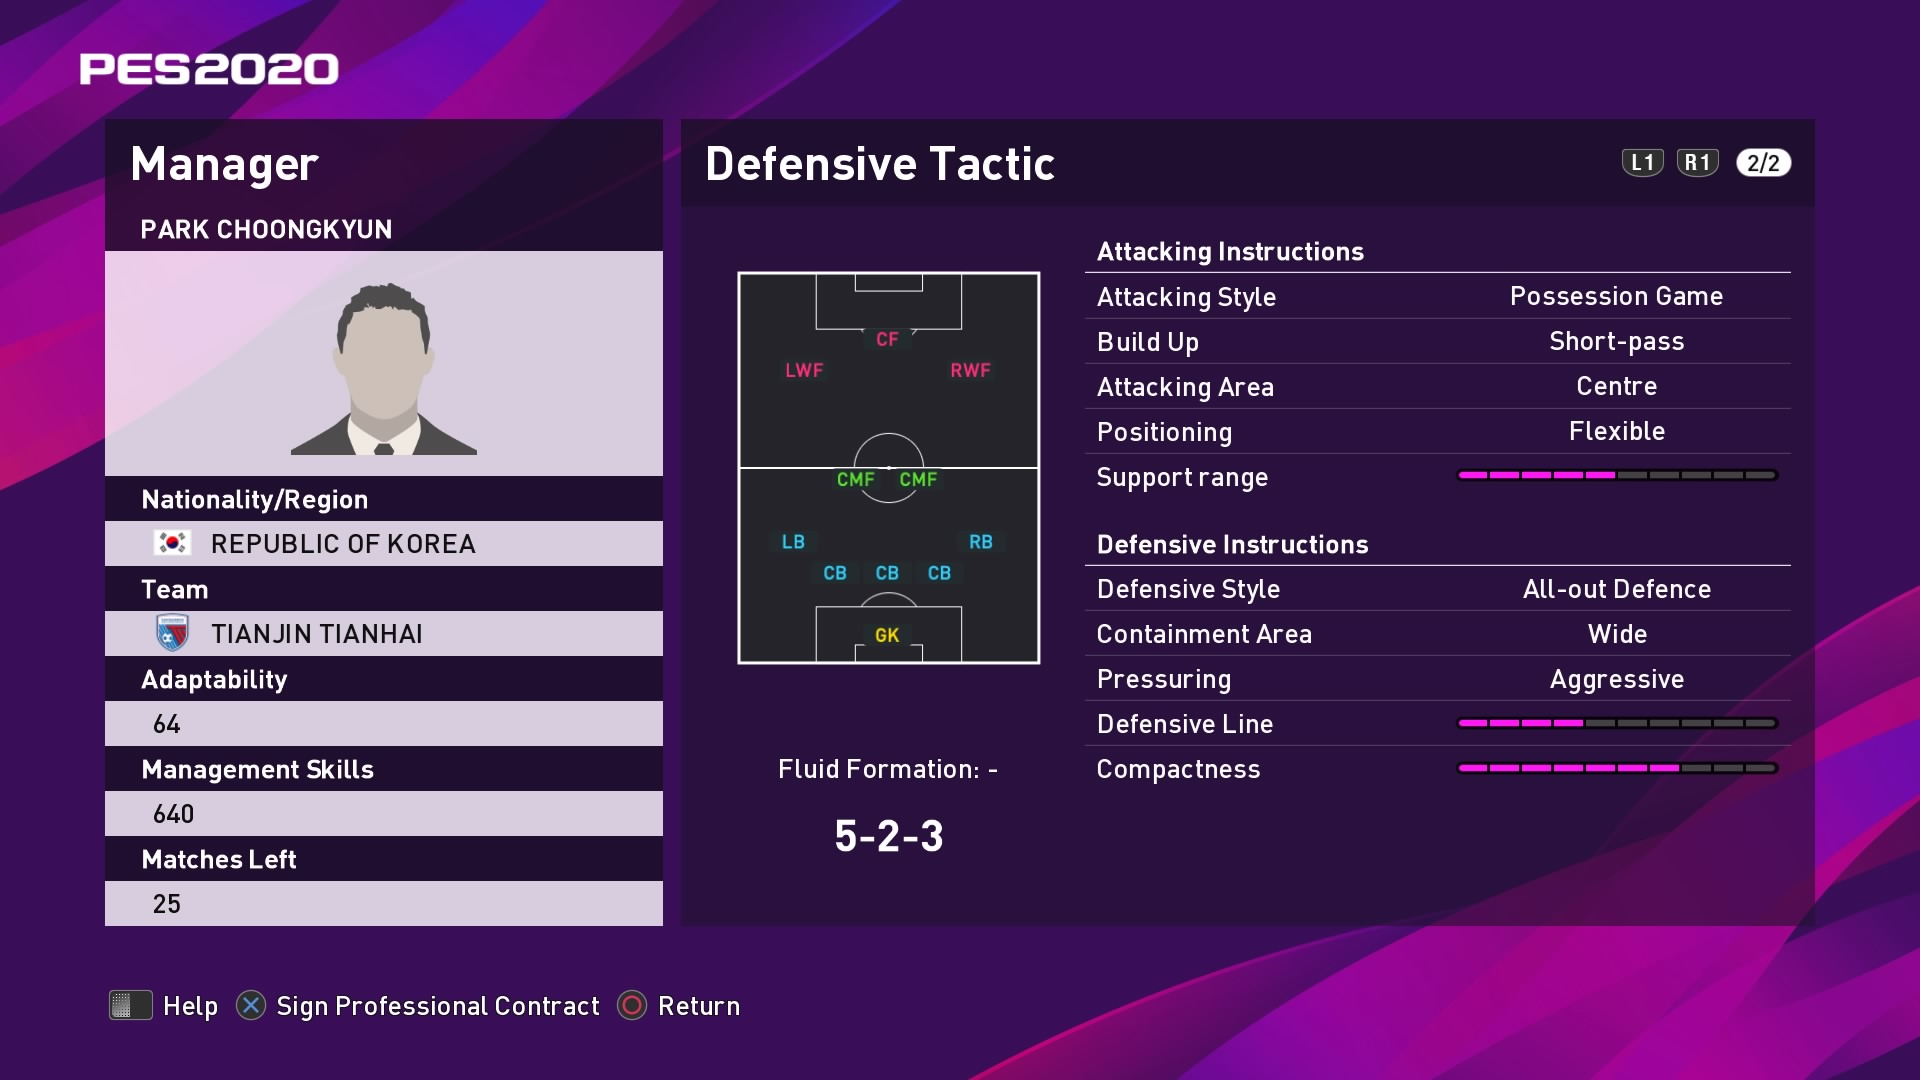 Park Choongkyun Defensive Tactic in PES 2020 myClub